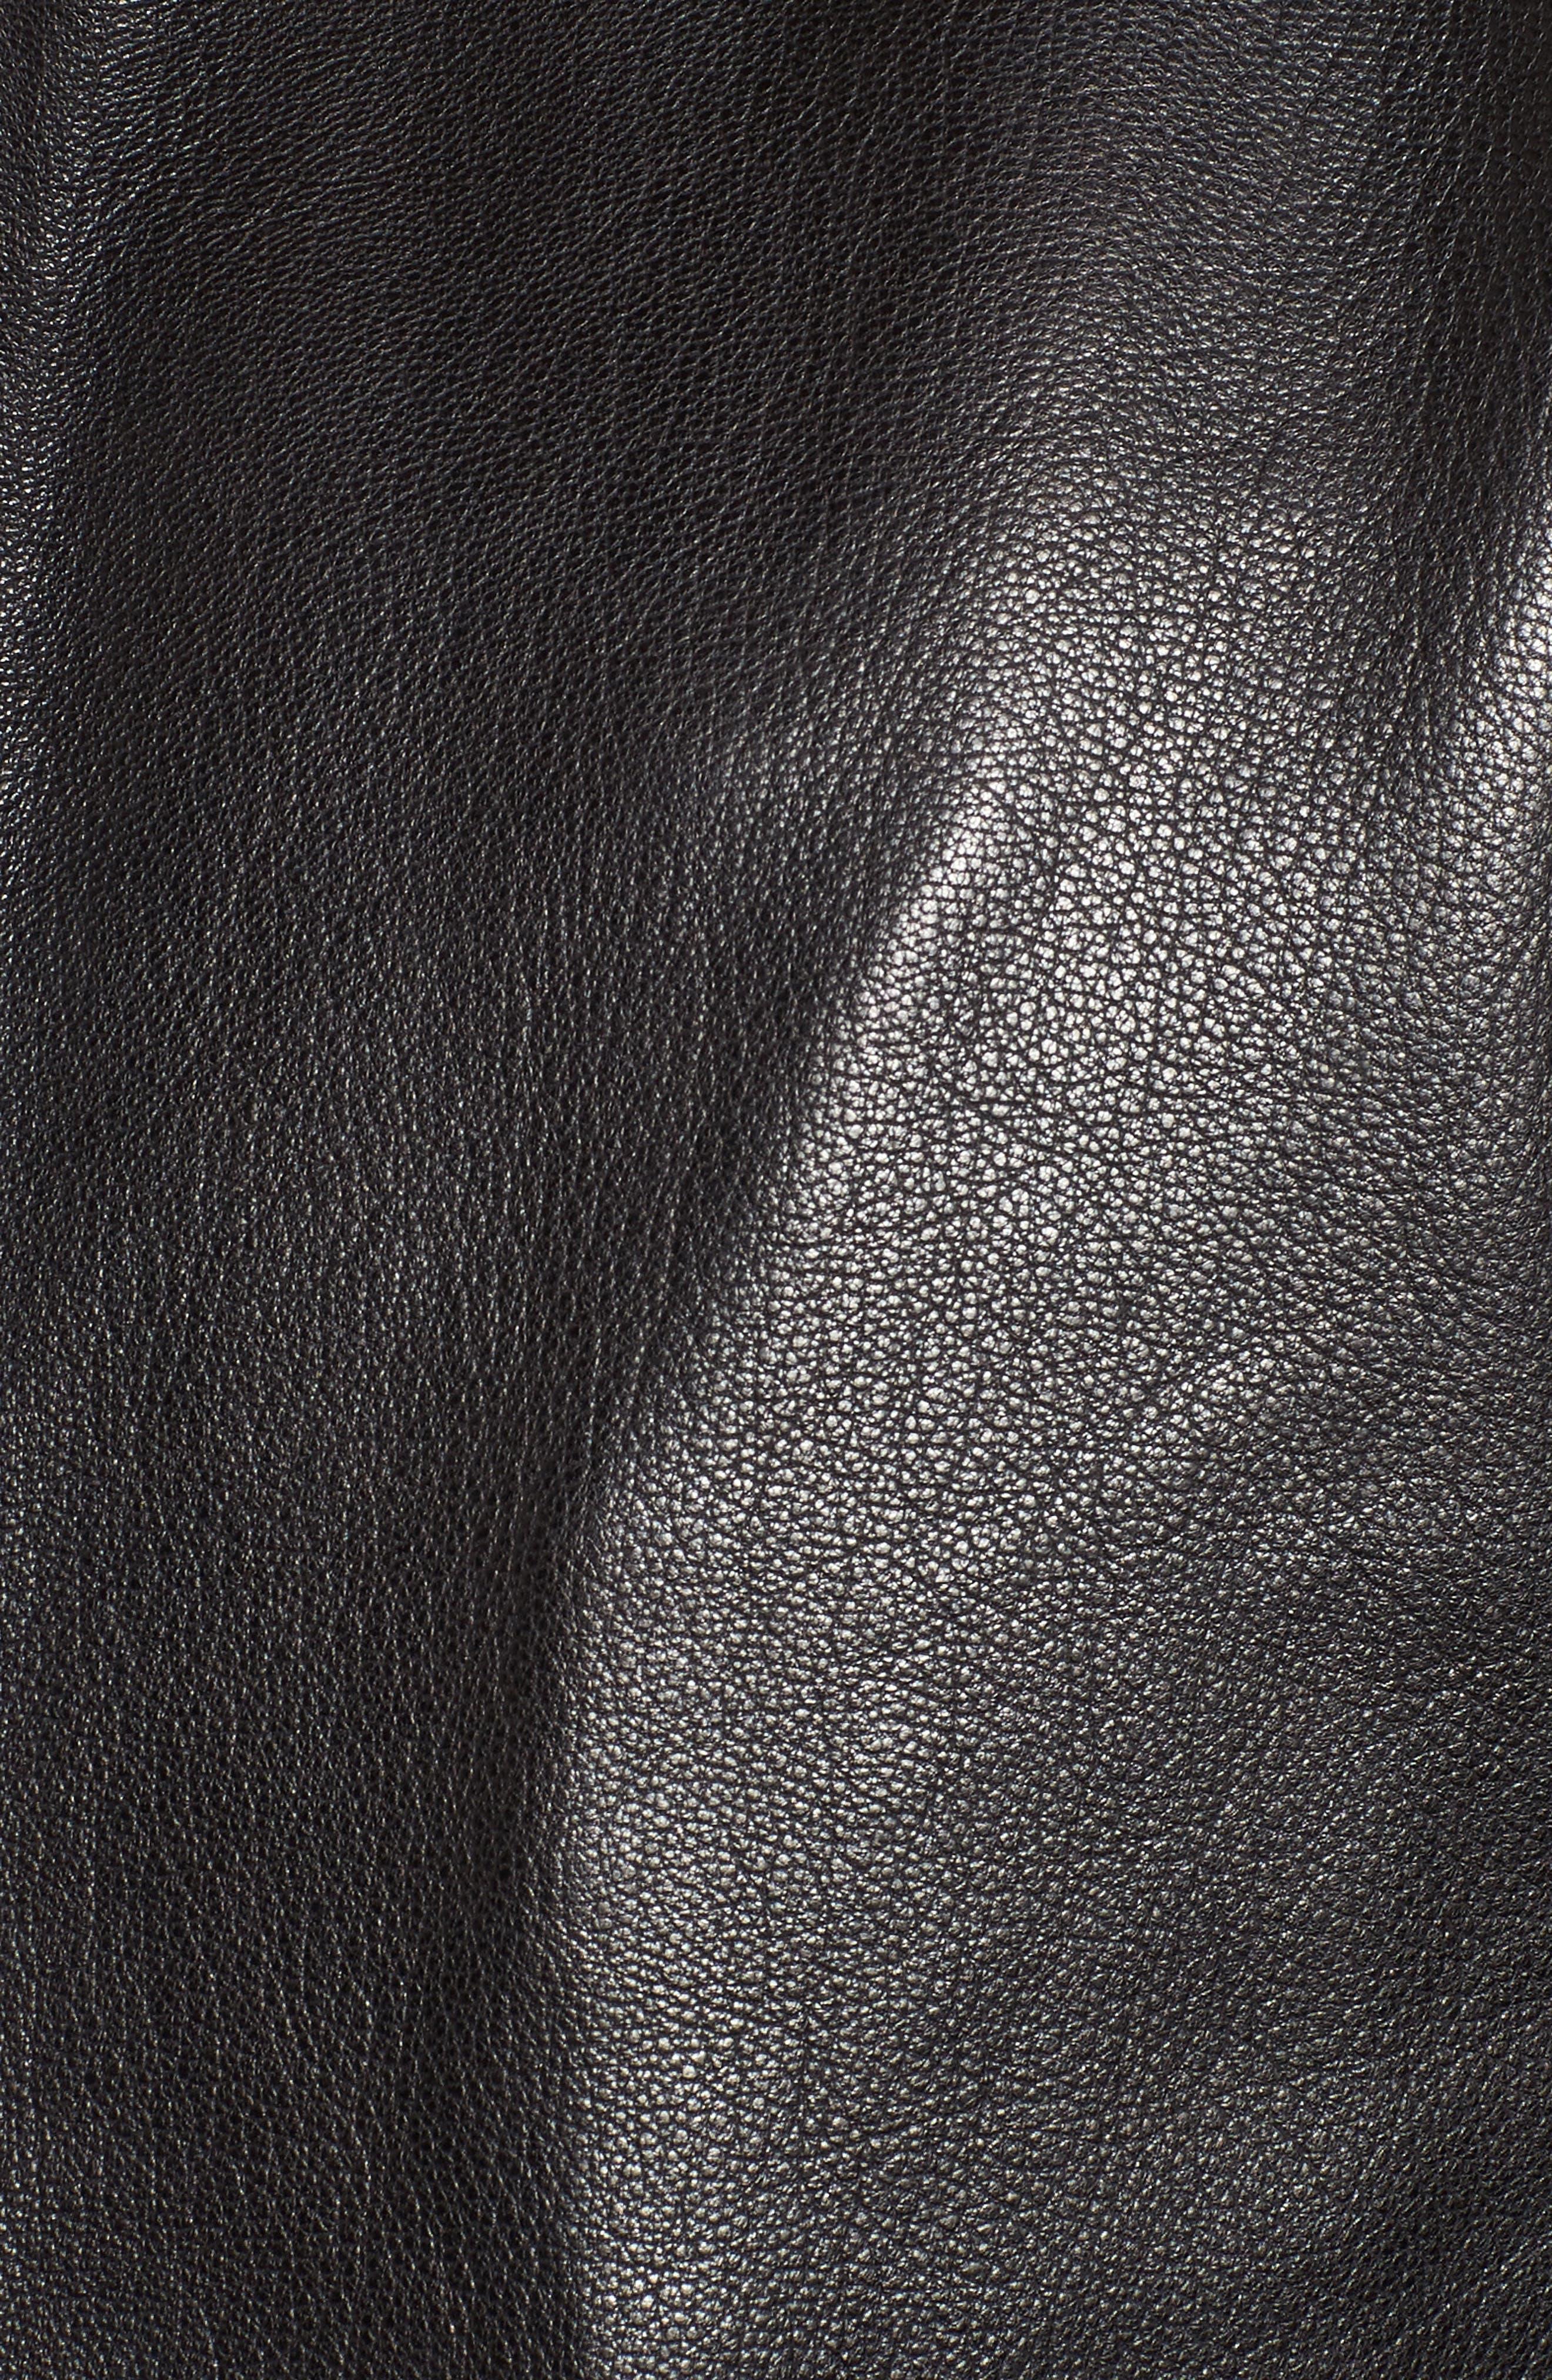 Mate Leather Biker Jacket,                             Alternate thumbnail 6, color,                             001